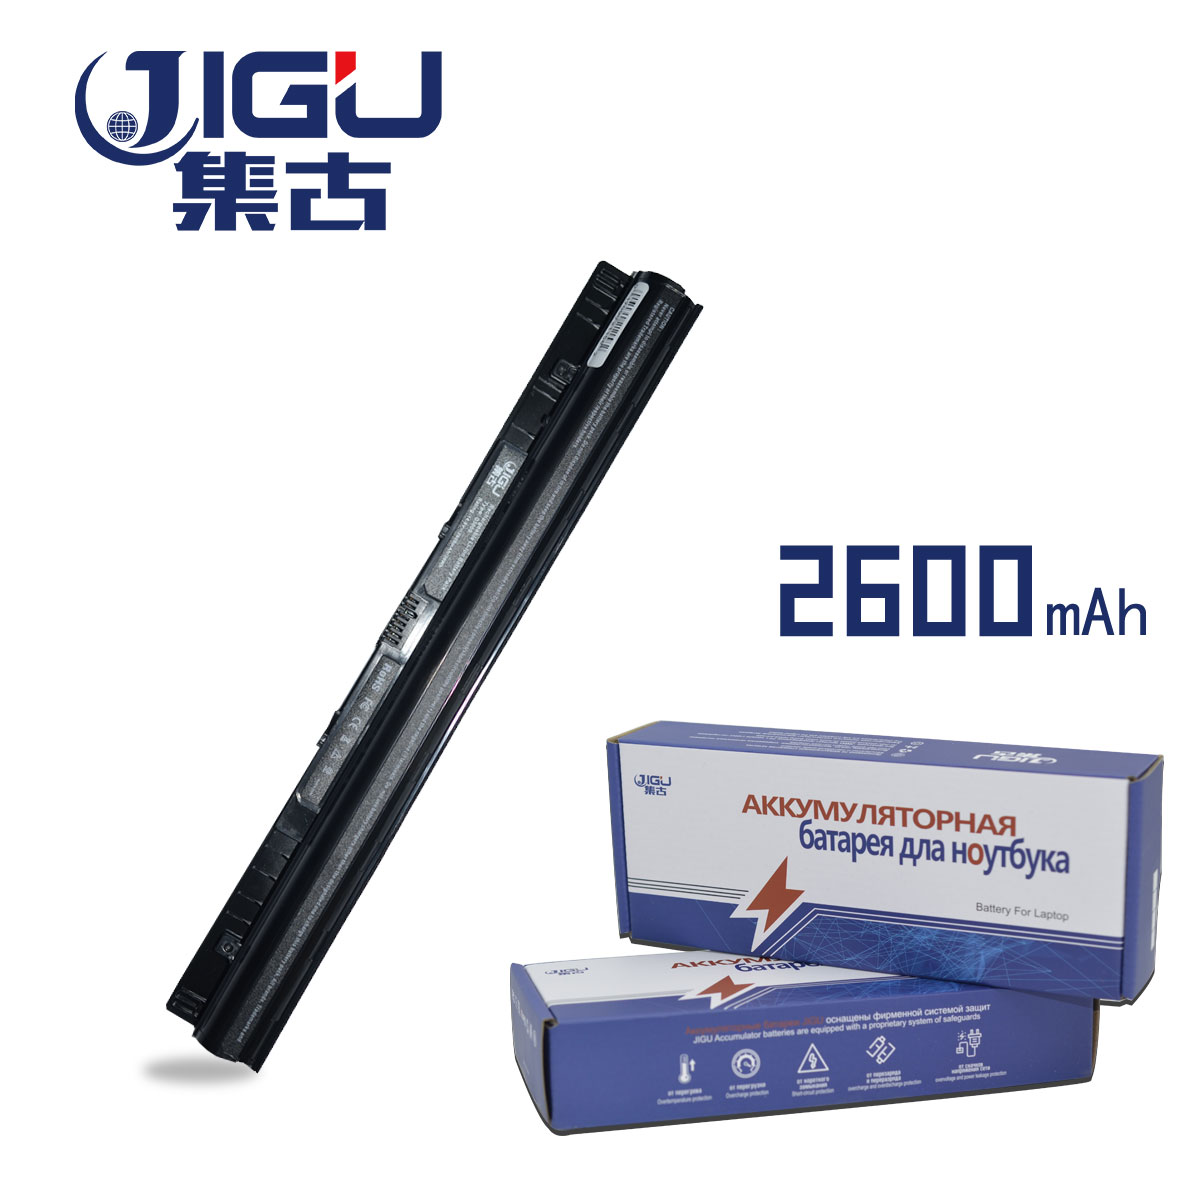 JIGU High Qualiy Laptop Battery FOR LENOVO L12M4A02 L12M4E01 L12S4A02 L12S4E01 IdeaPad G400s G410s G500s S510p S410p Z710 new laptop charge socket port dc power jack harness cable for lenovo ideapad z710 z710 5938 z710 5939 z710 5940 z710 20250